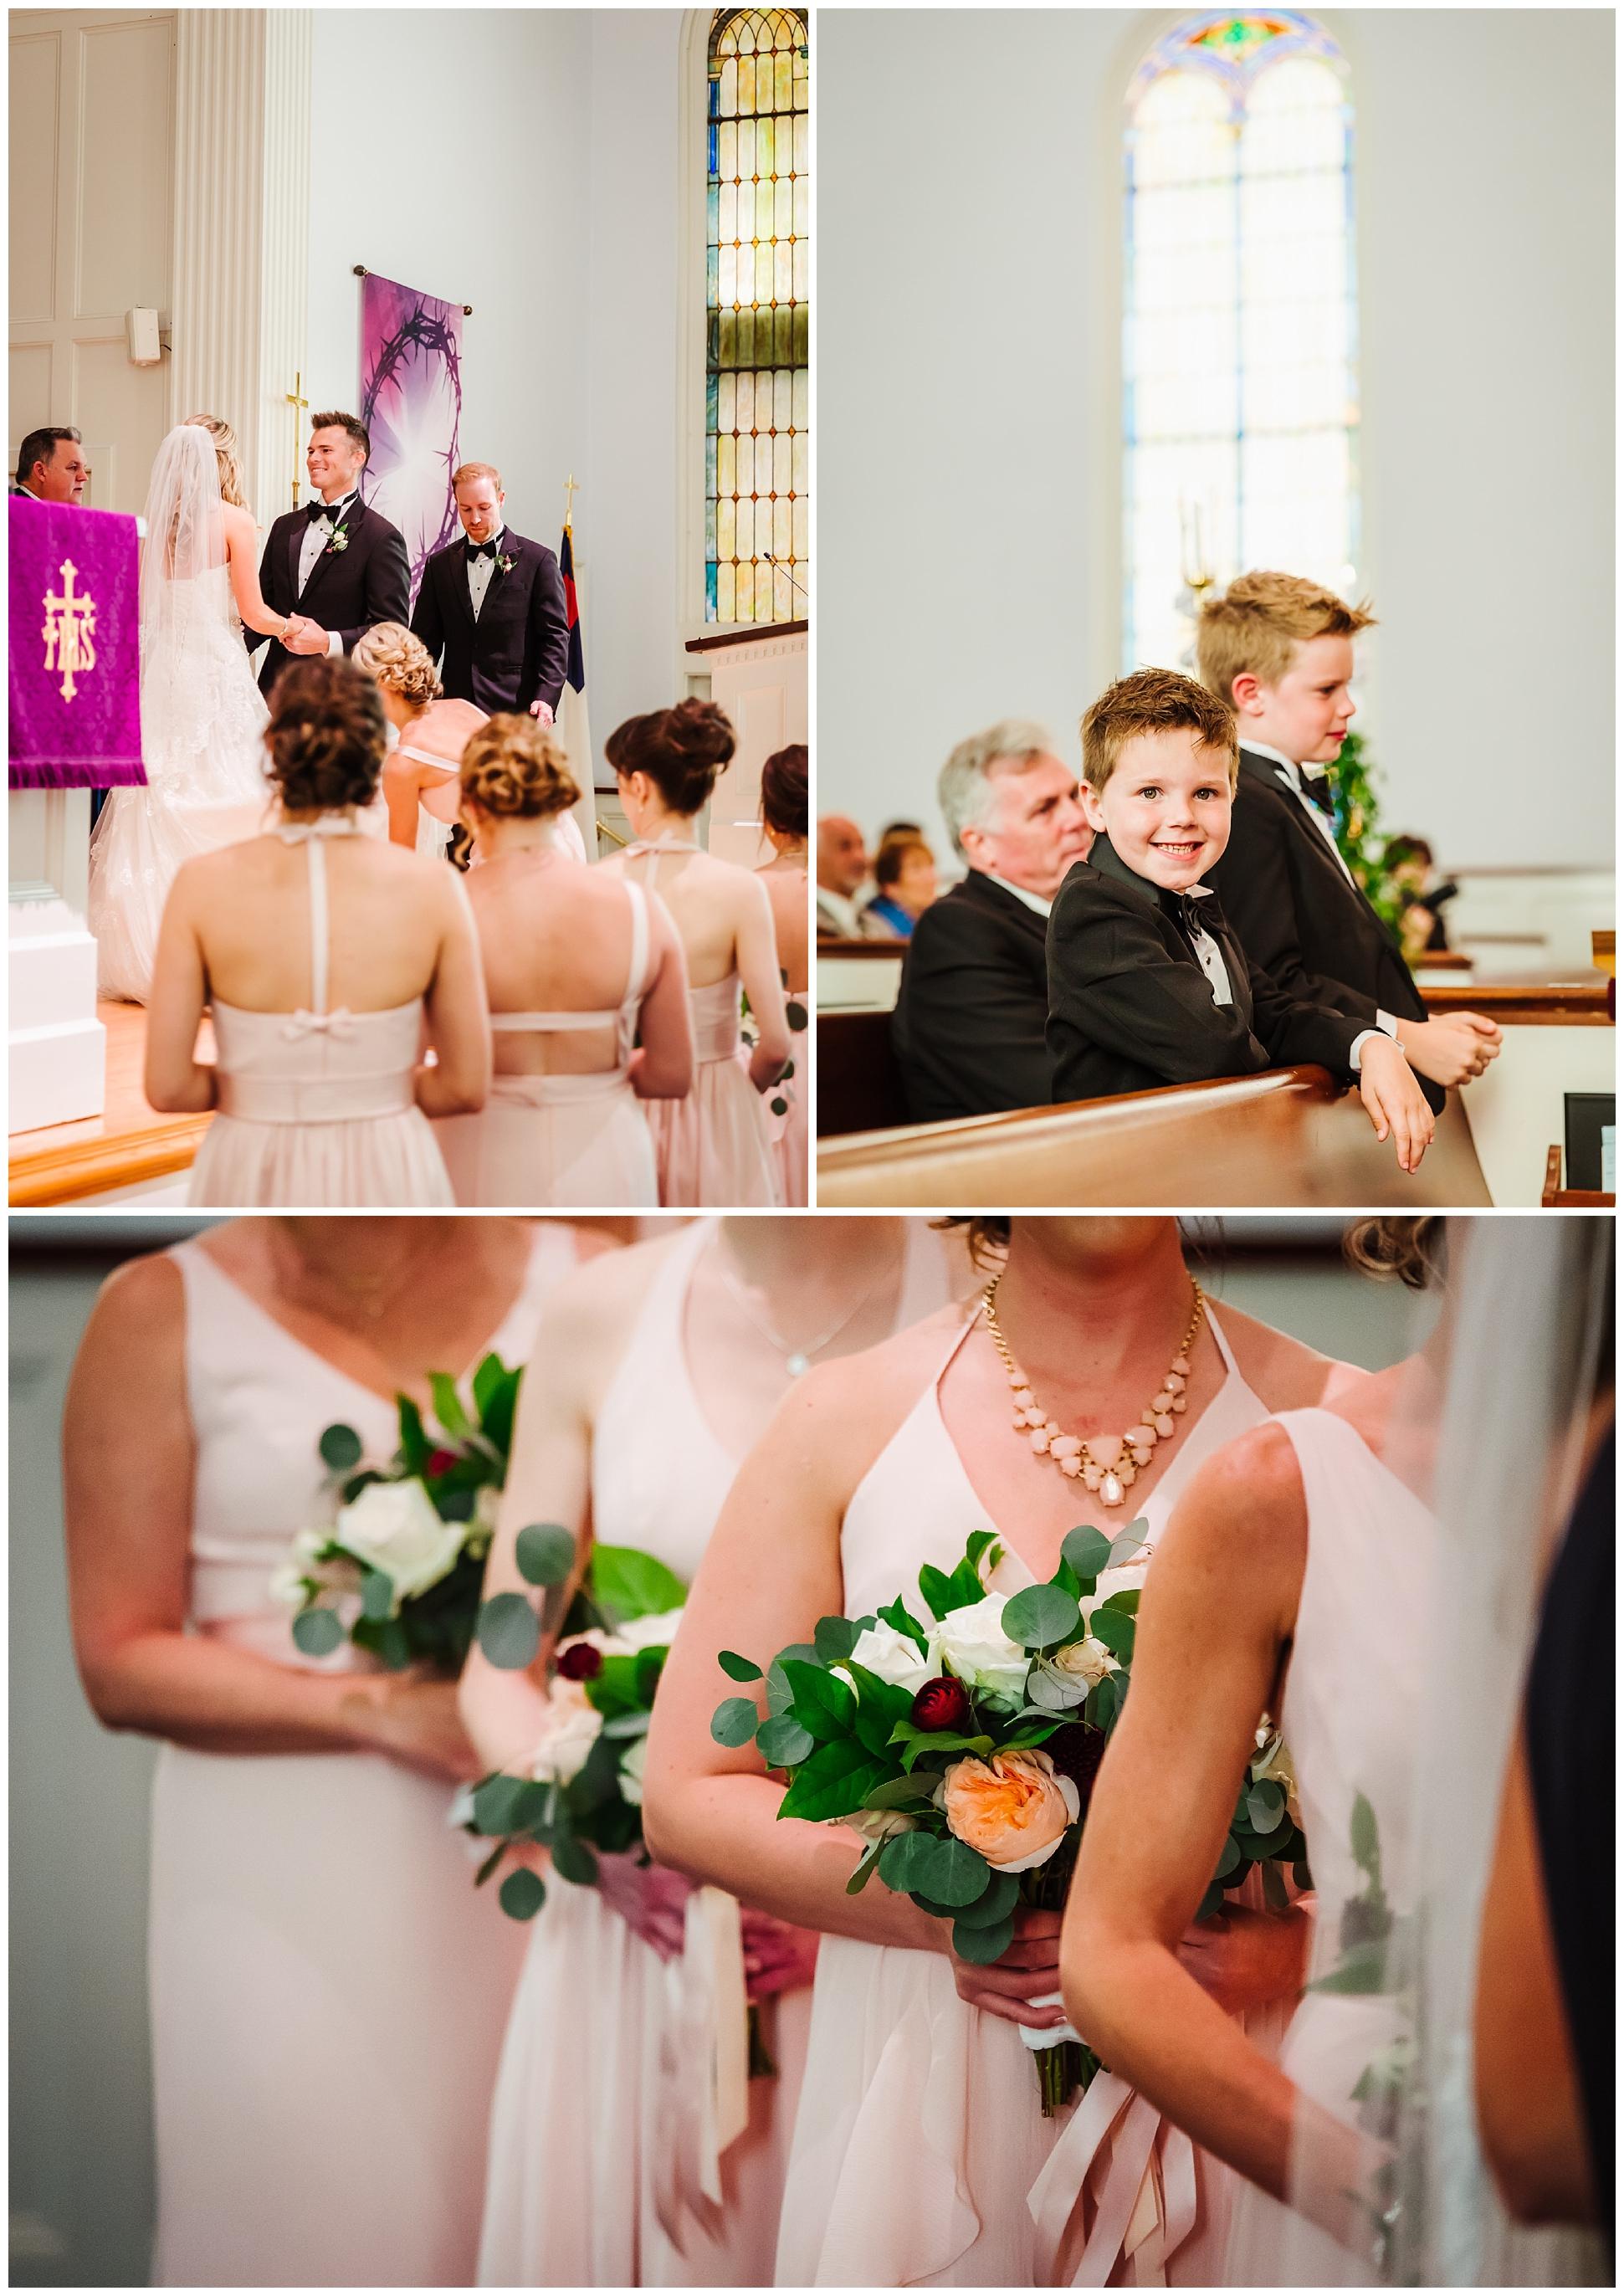 tampa-bradenton-wedding-photographer-south-florida-museum-classic-blush-gold-alpacas-sparklers_0049.jpg